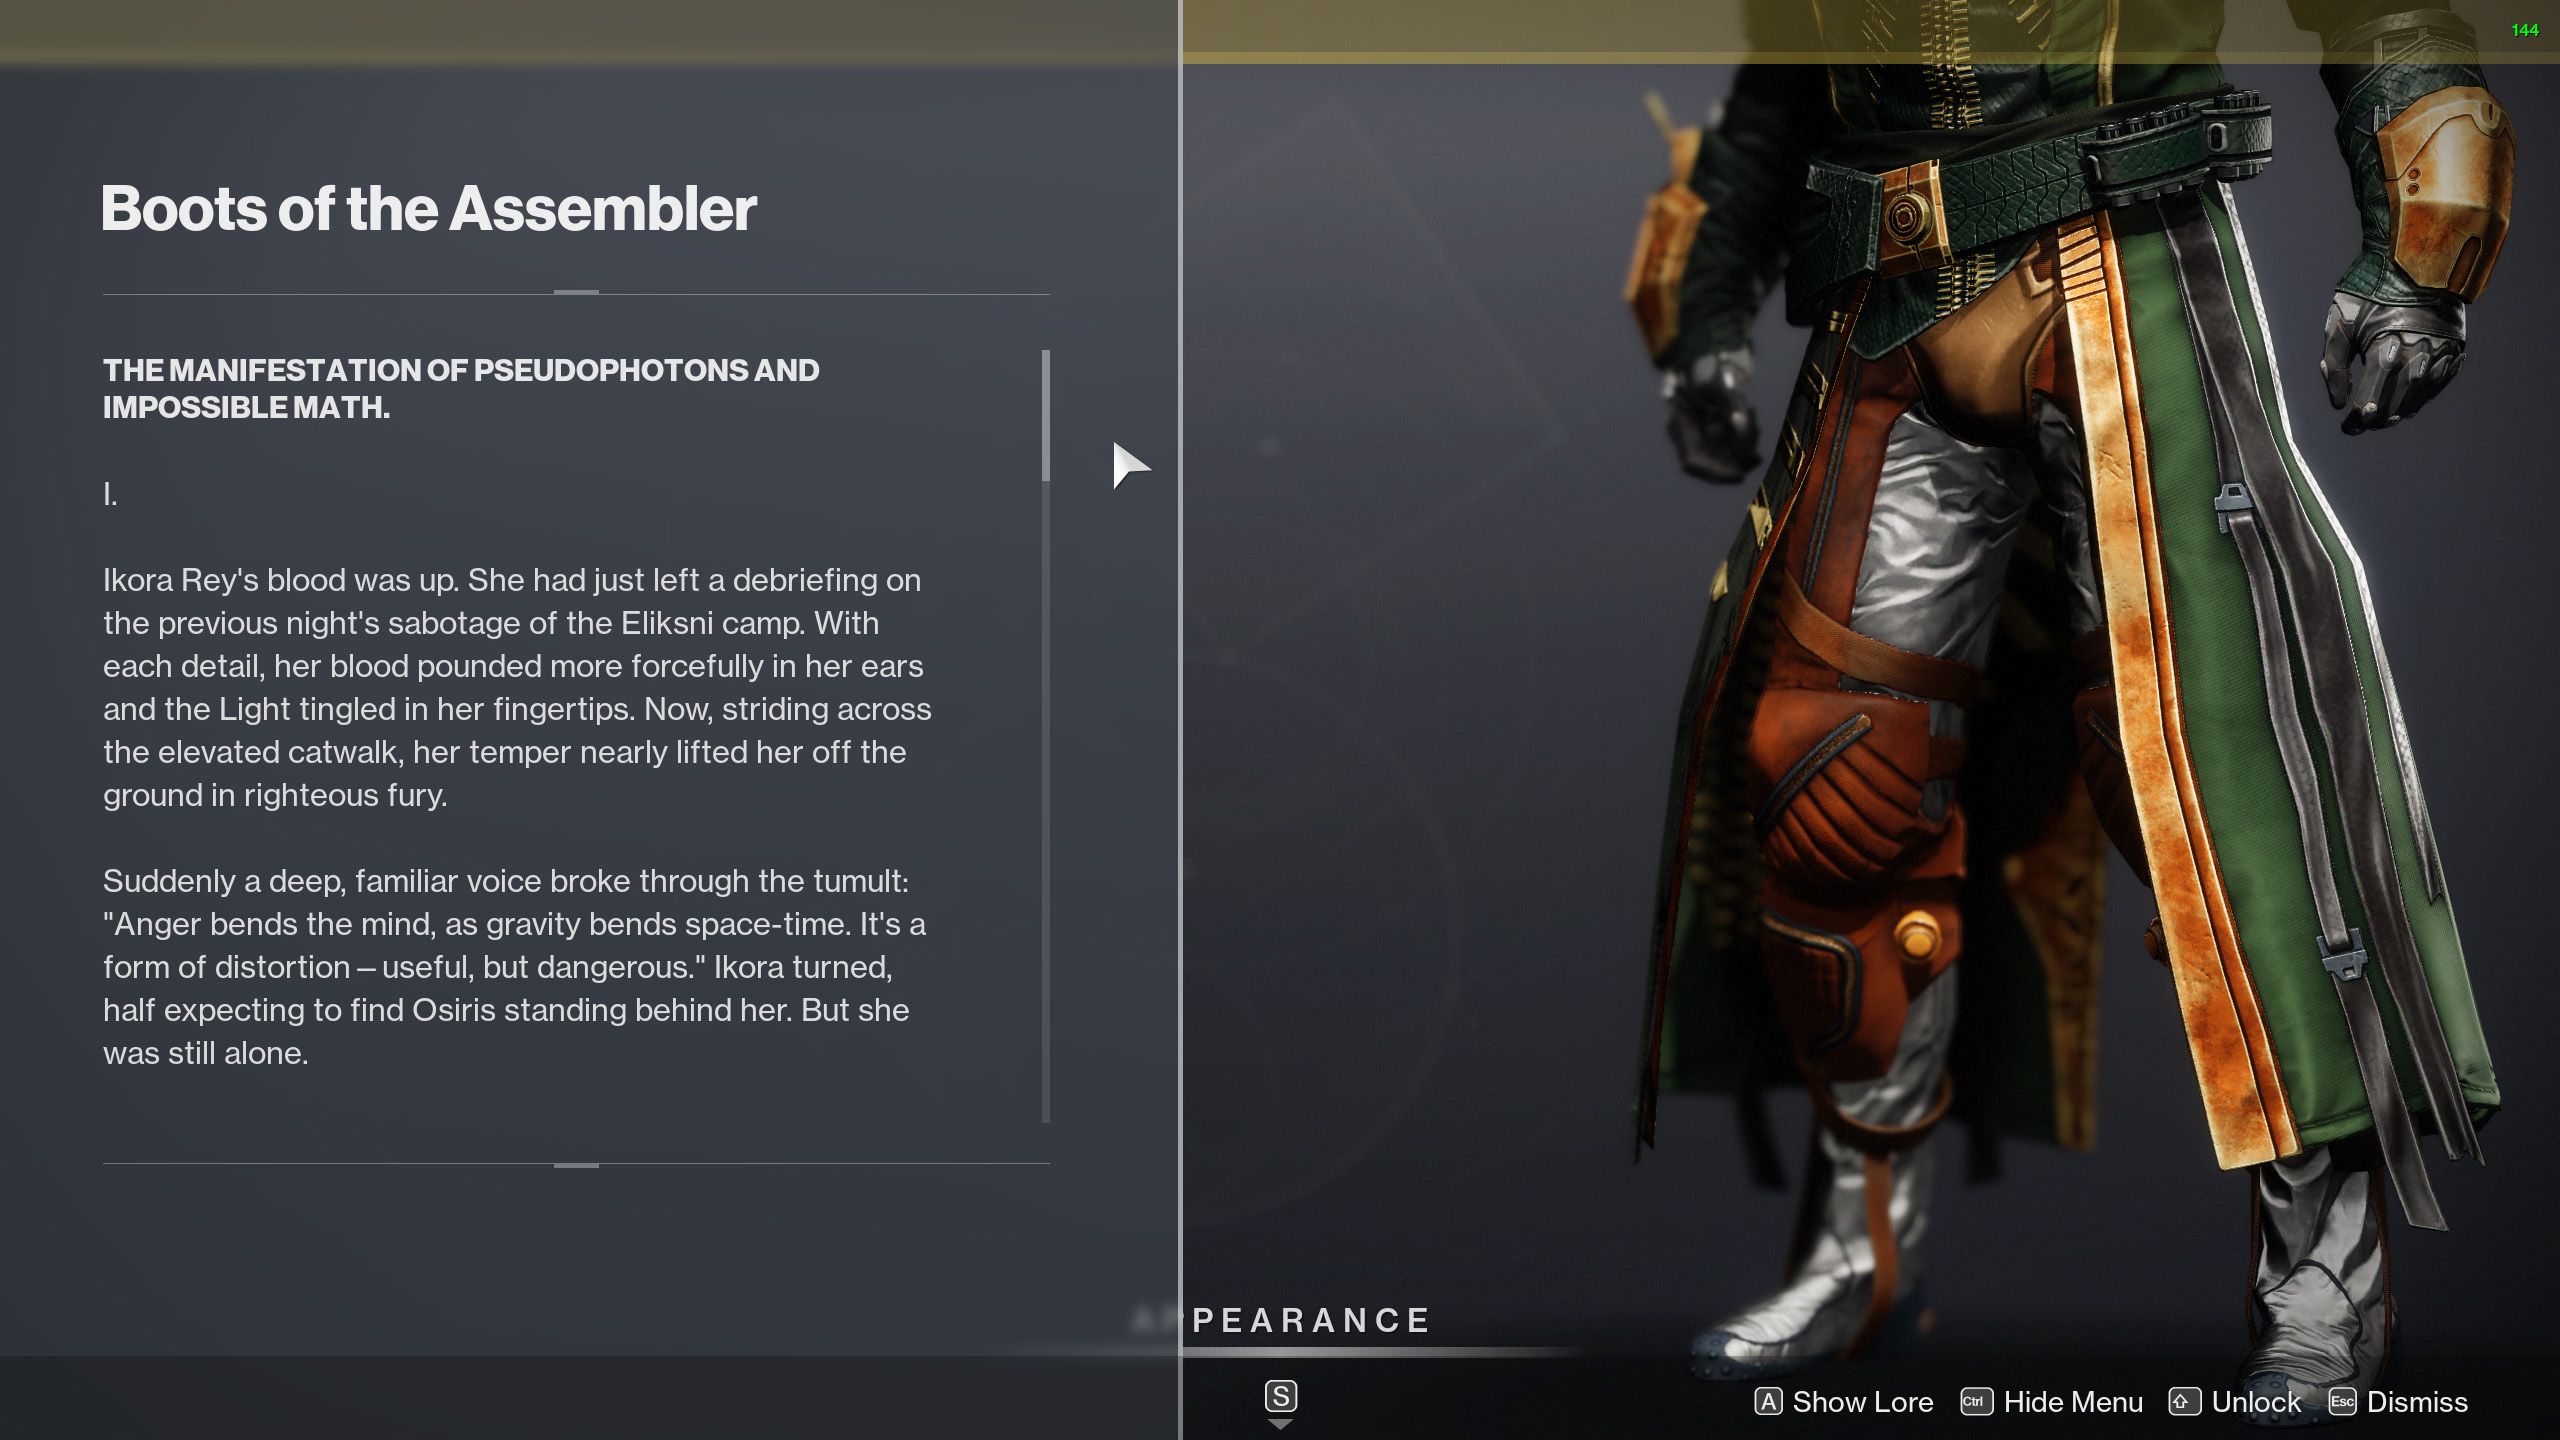 destiny 2 boots of the assembler lore